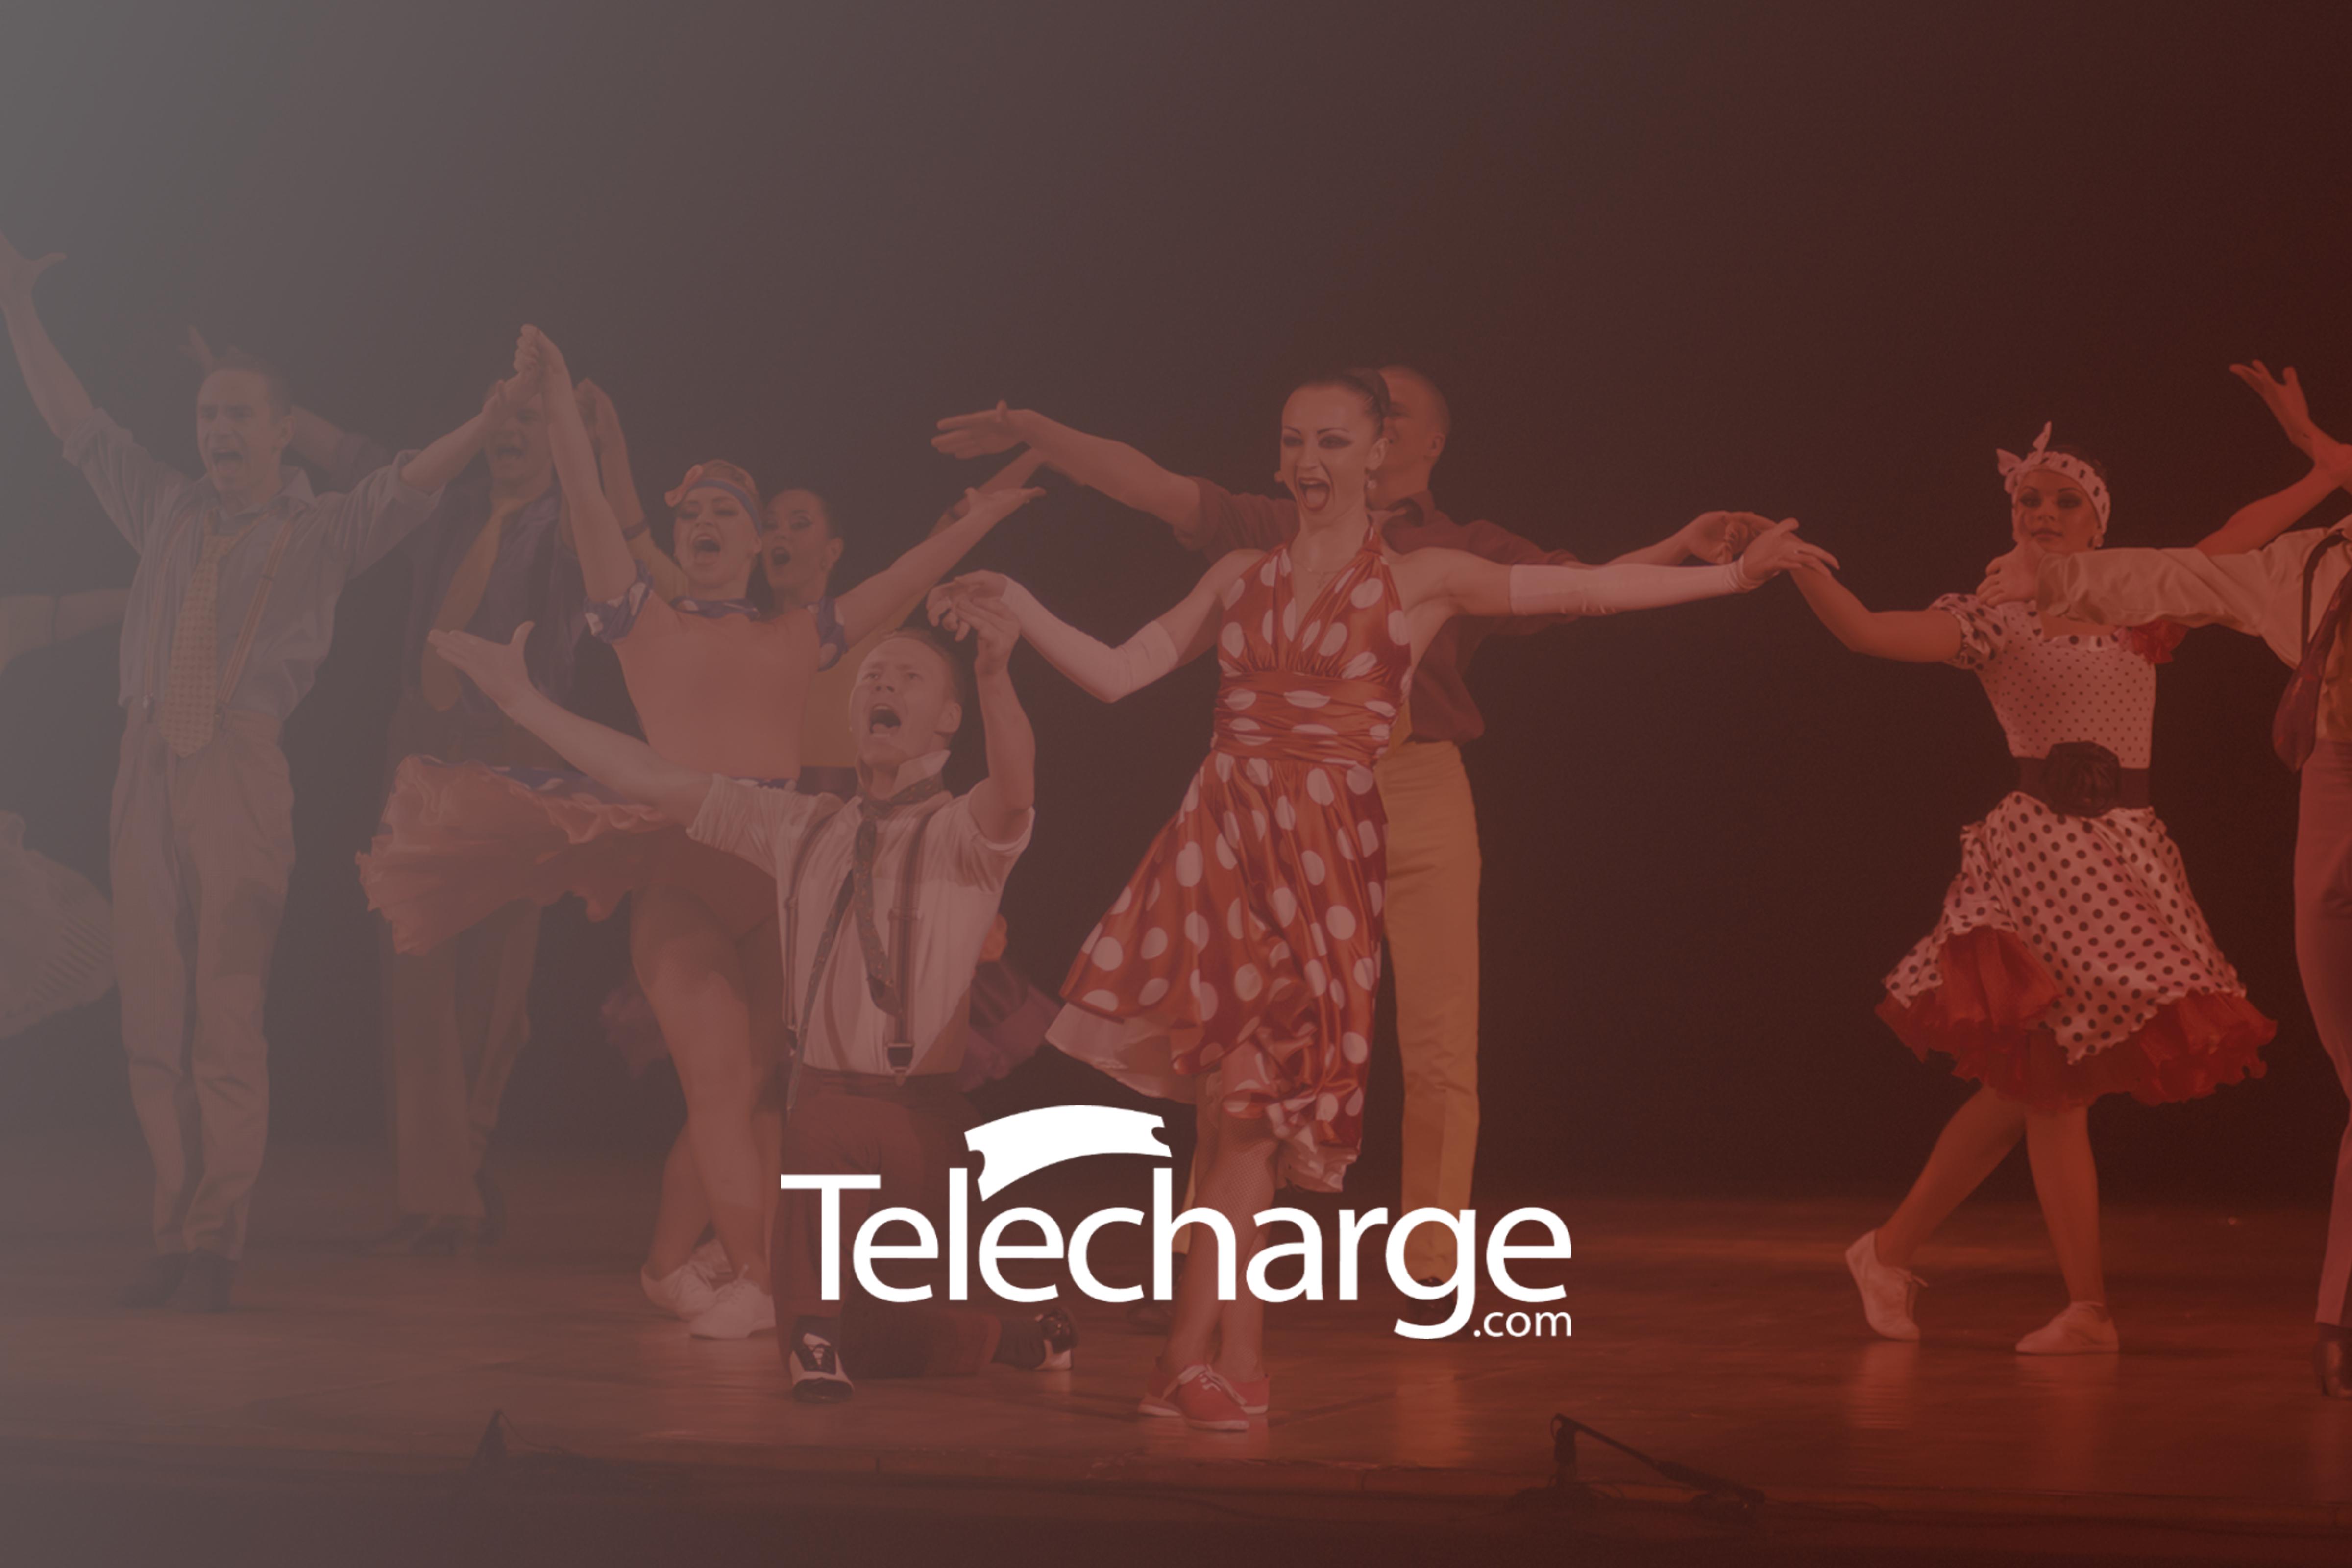 Telecharge_Thumbnail_CaseStudy